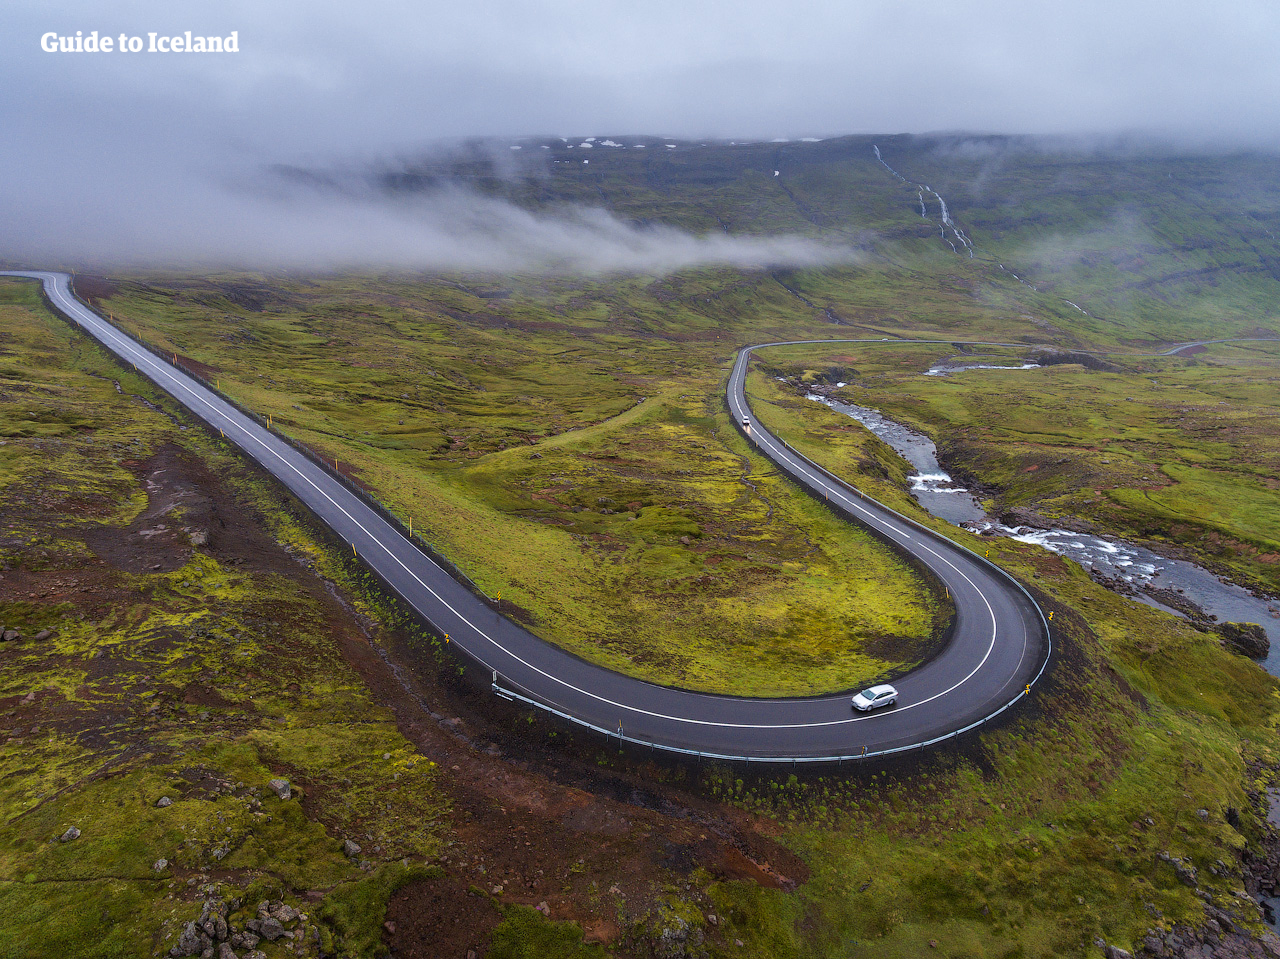 islandia-guide-to-iceland-3